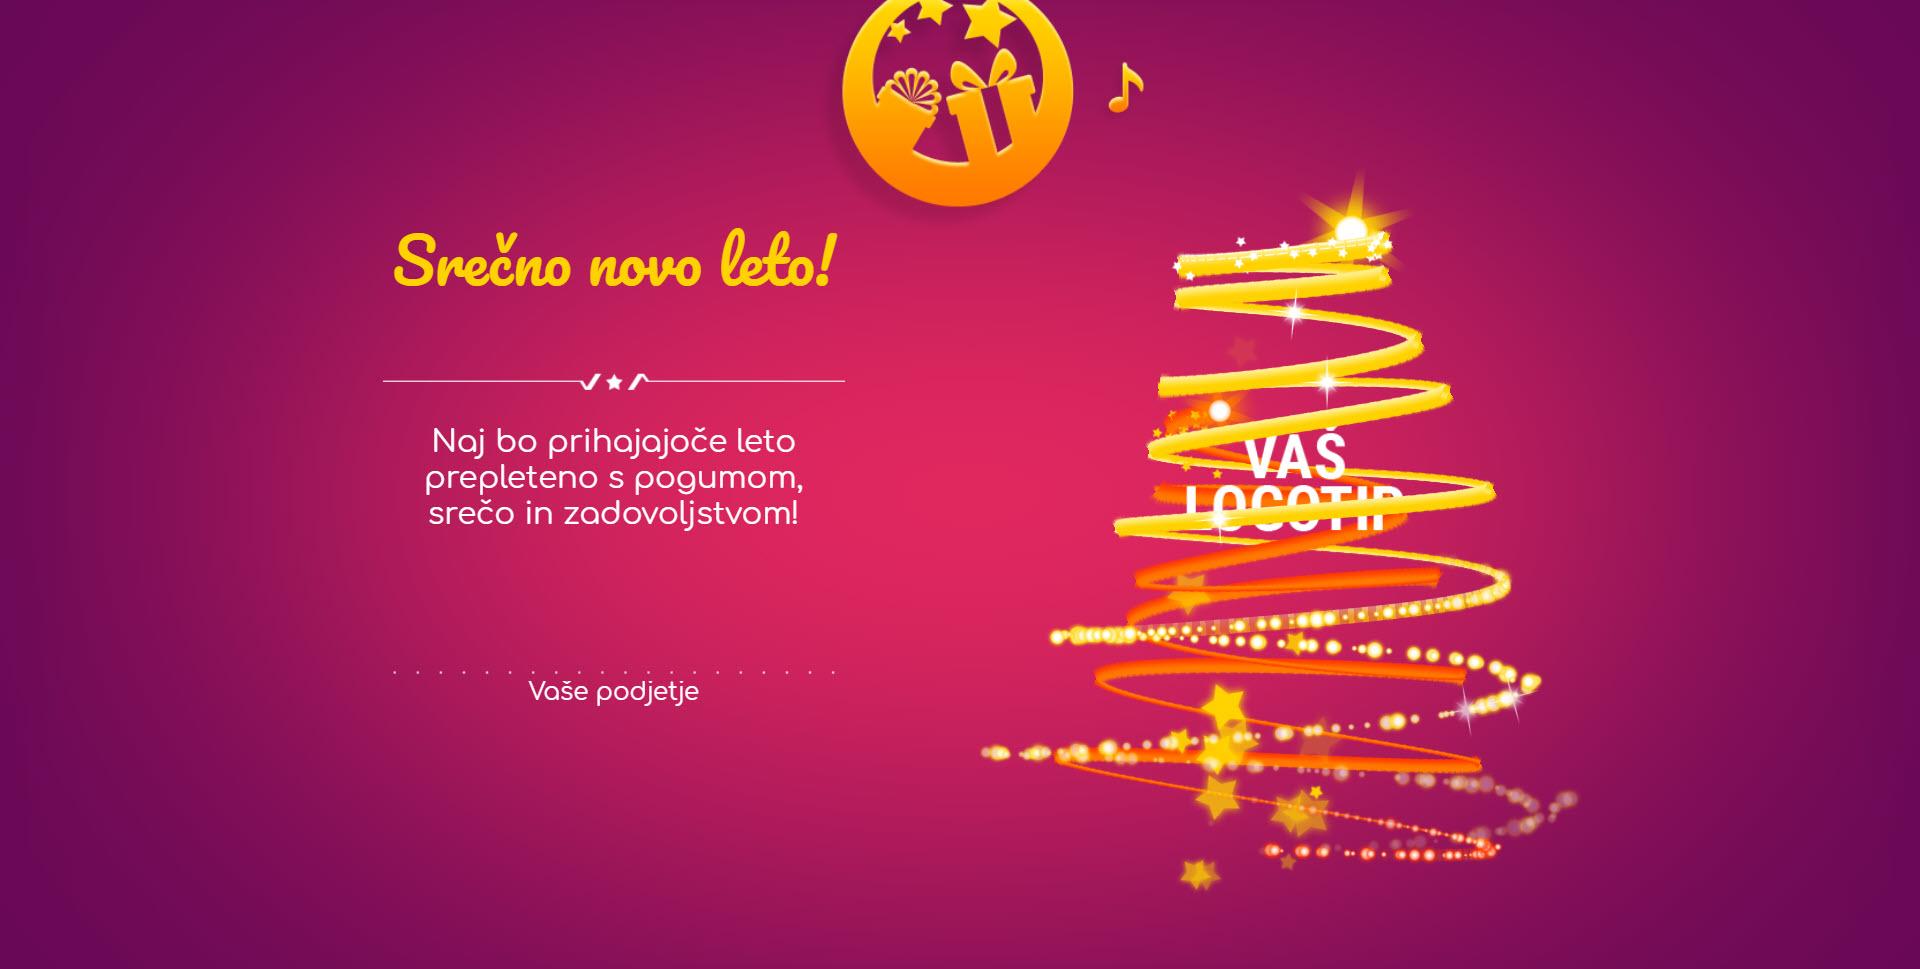 christmas card tree of lights version purple - Naročilo voščilnice